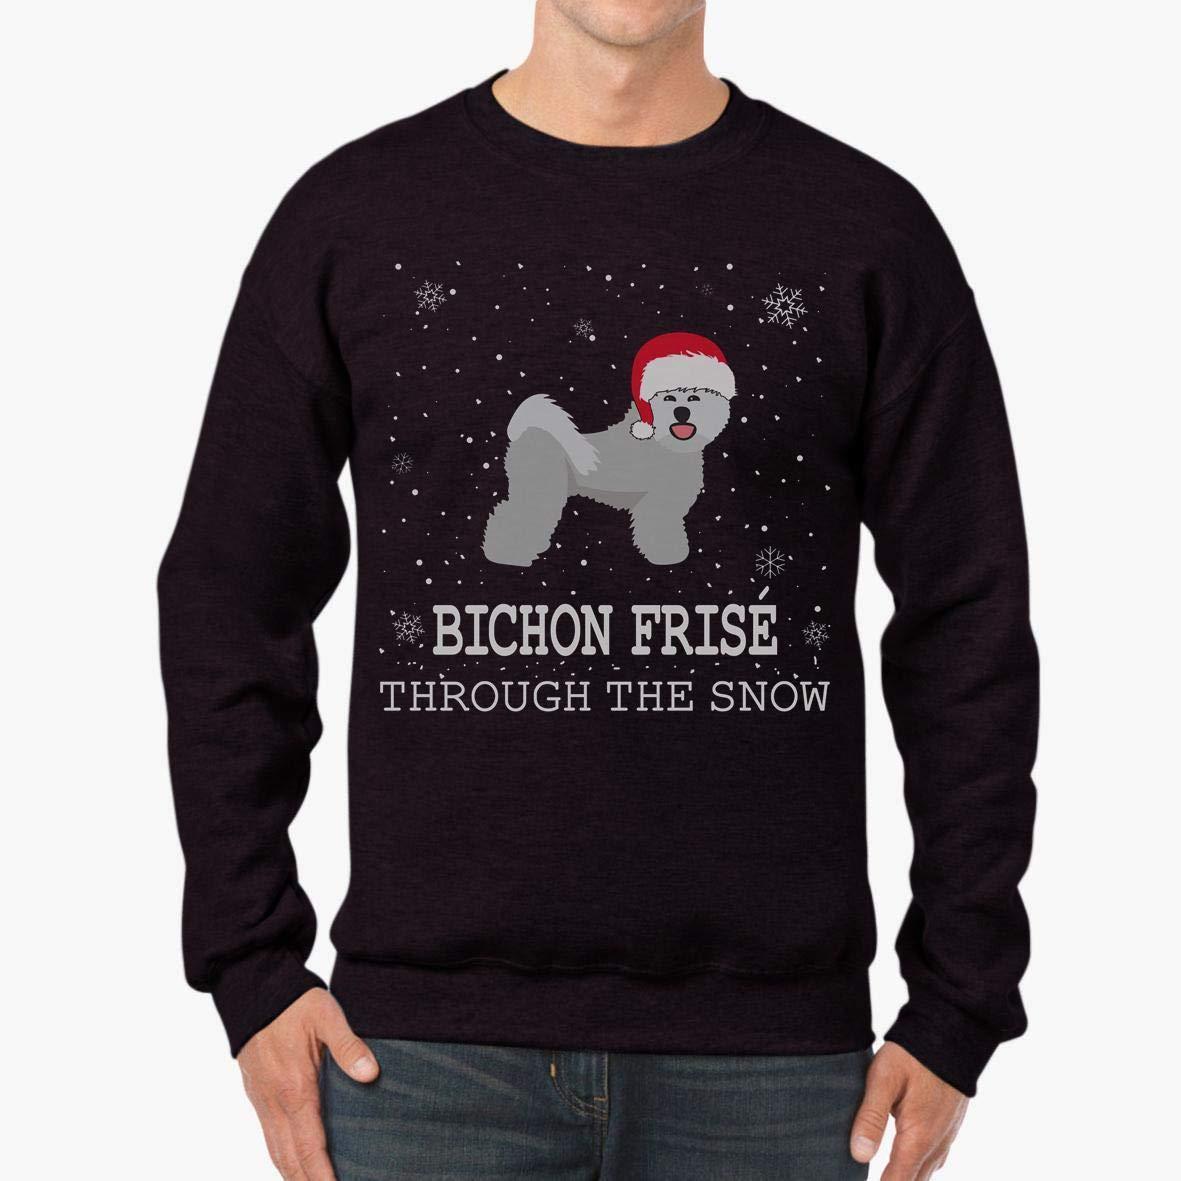 Doryti Bichon Fris/é Through The Snow Happy Holiday Unisex Sweatshirt tee